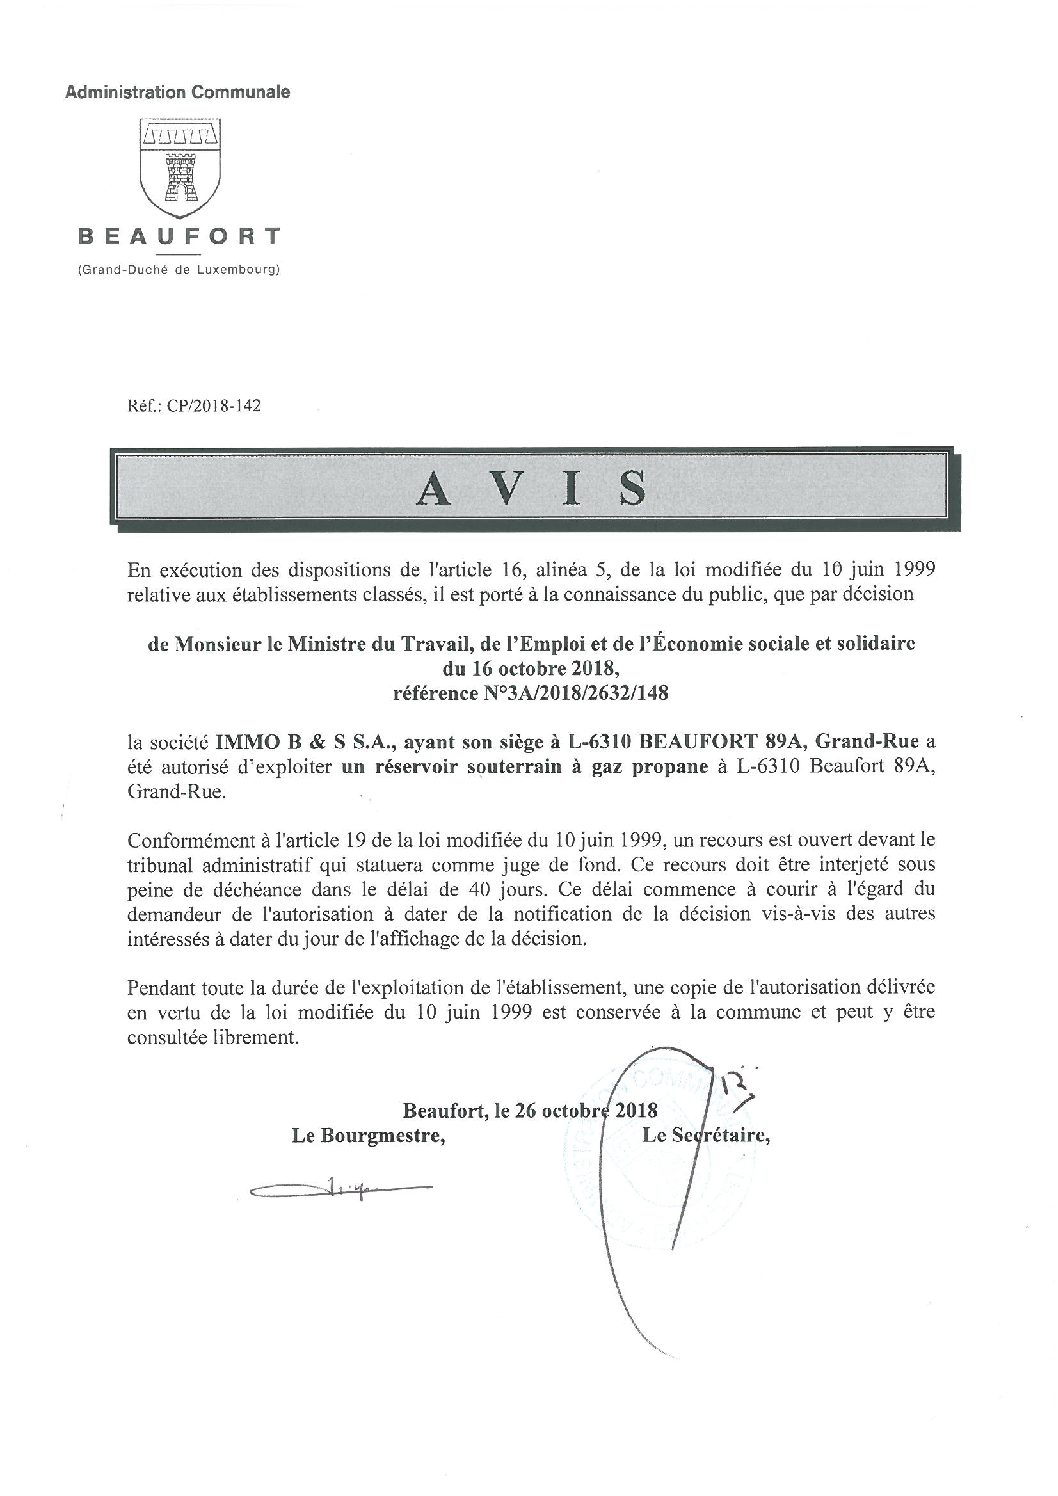 20181026_Avis2